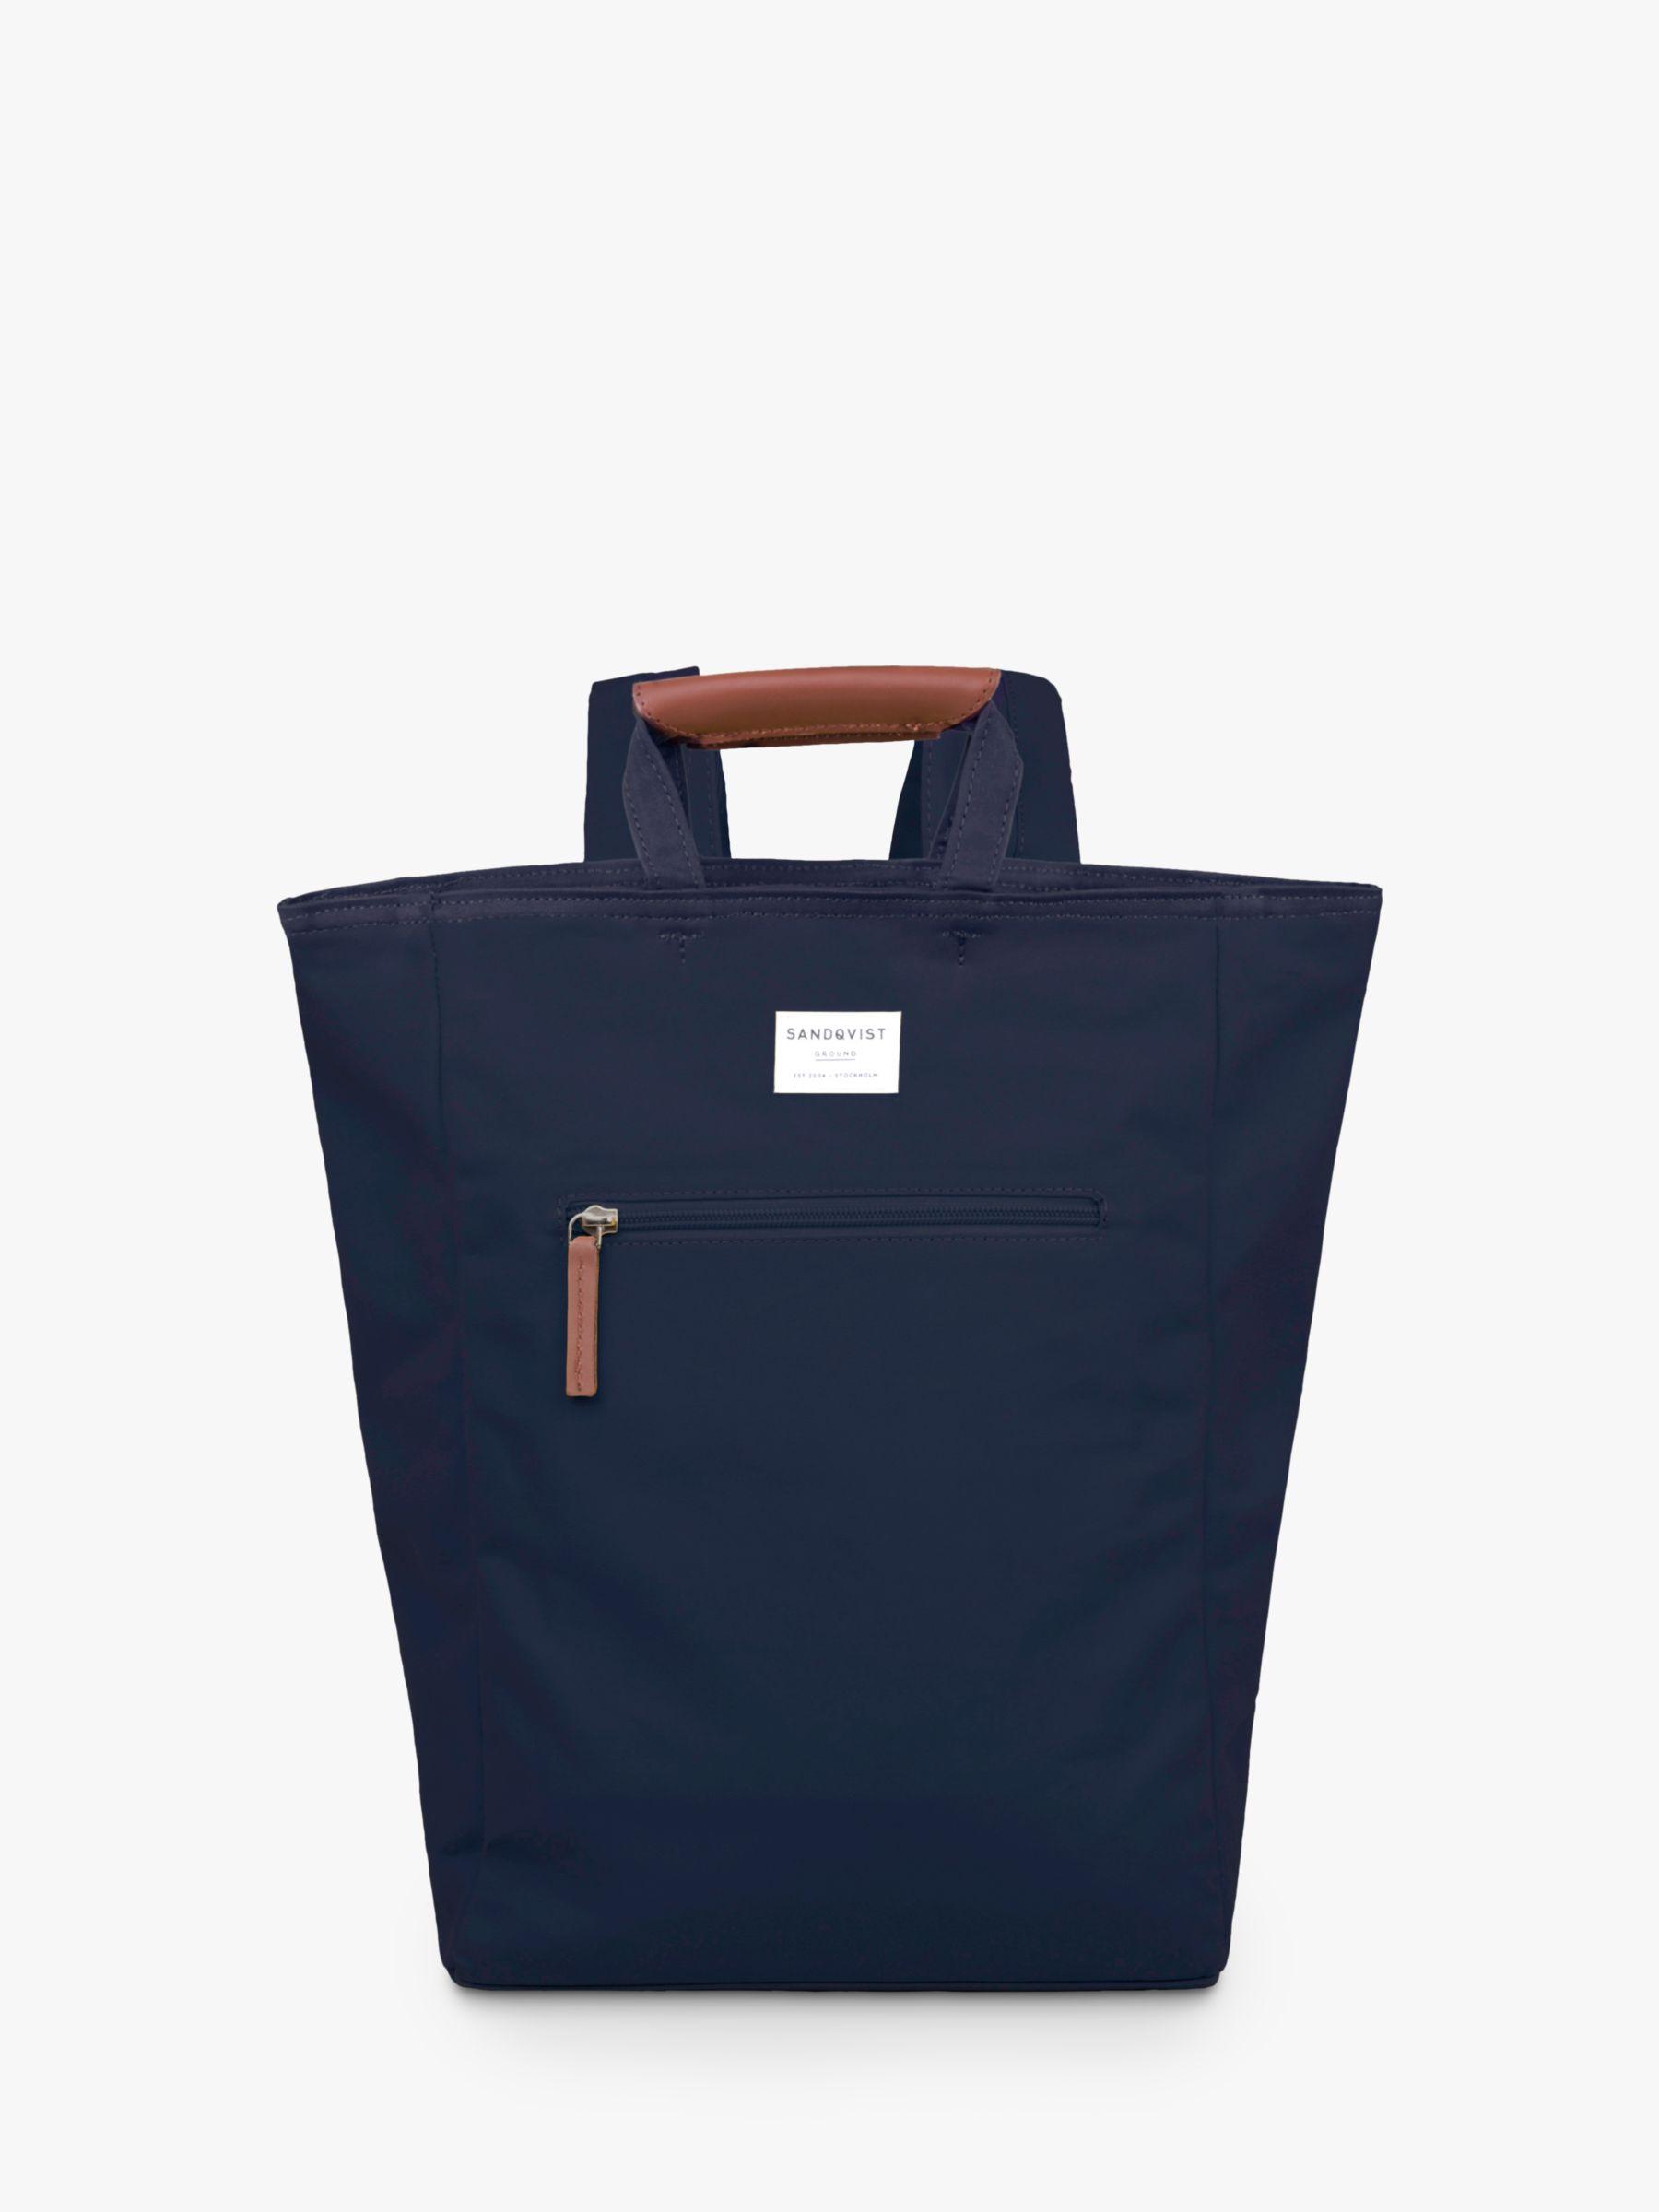 Sandqvist Sandqvist Tony Ground Organic Cotton Backpack